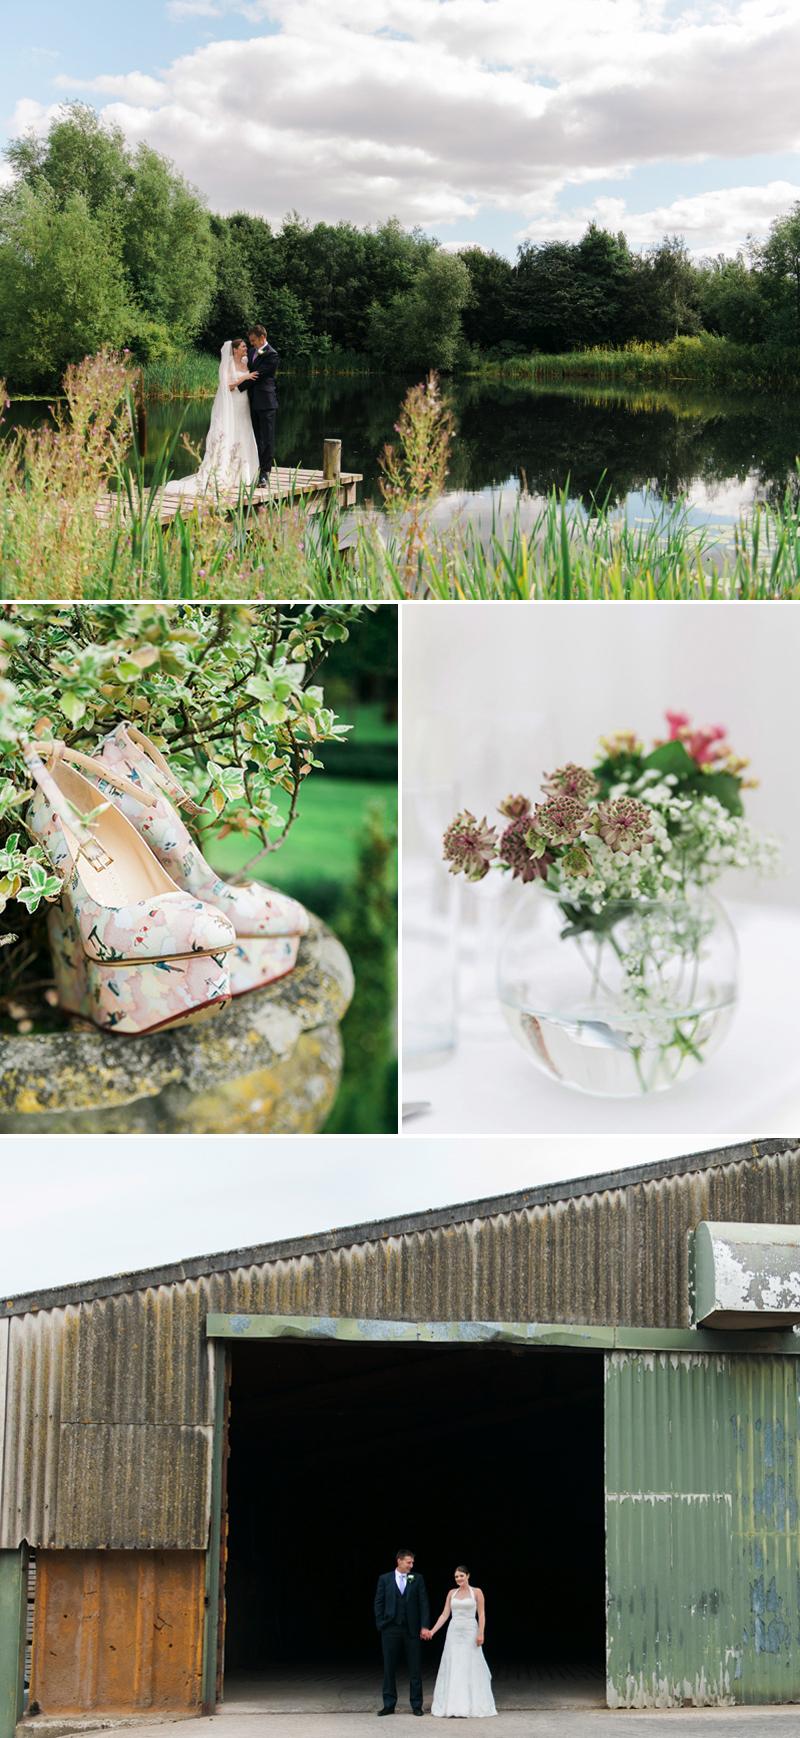 wedding-venue-photography-tips-theresa-furey-photography-coco-wedding-venues-003